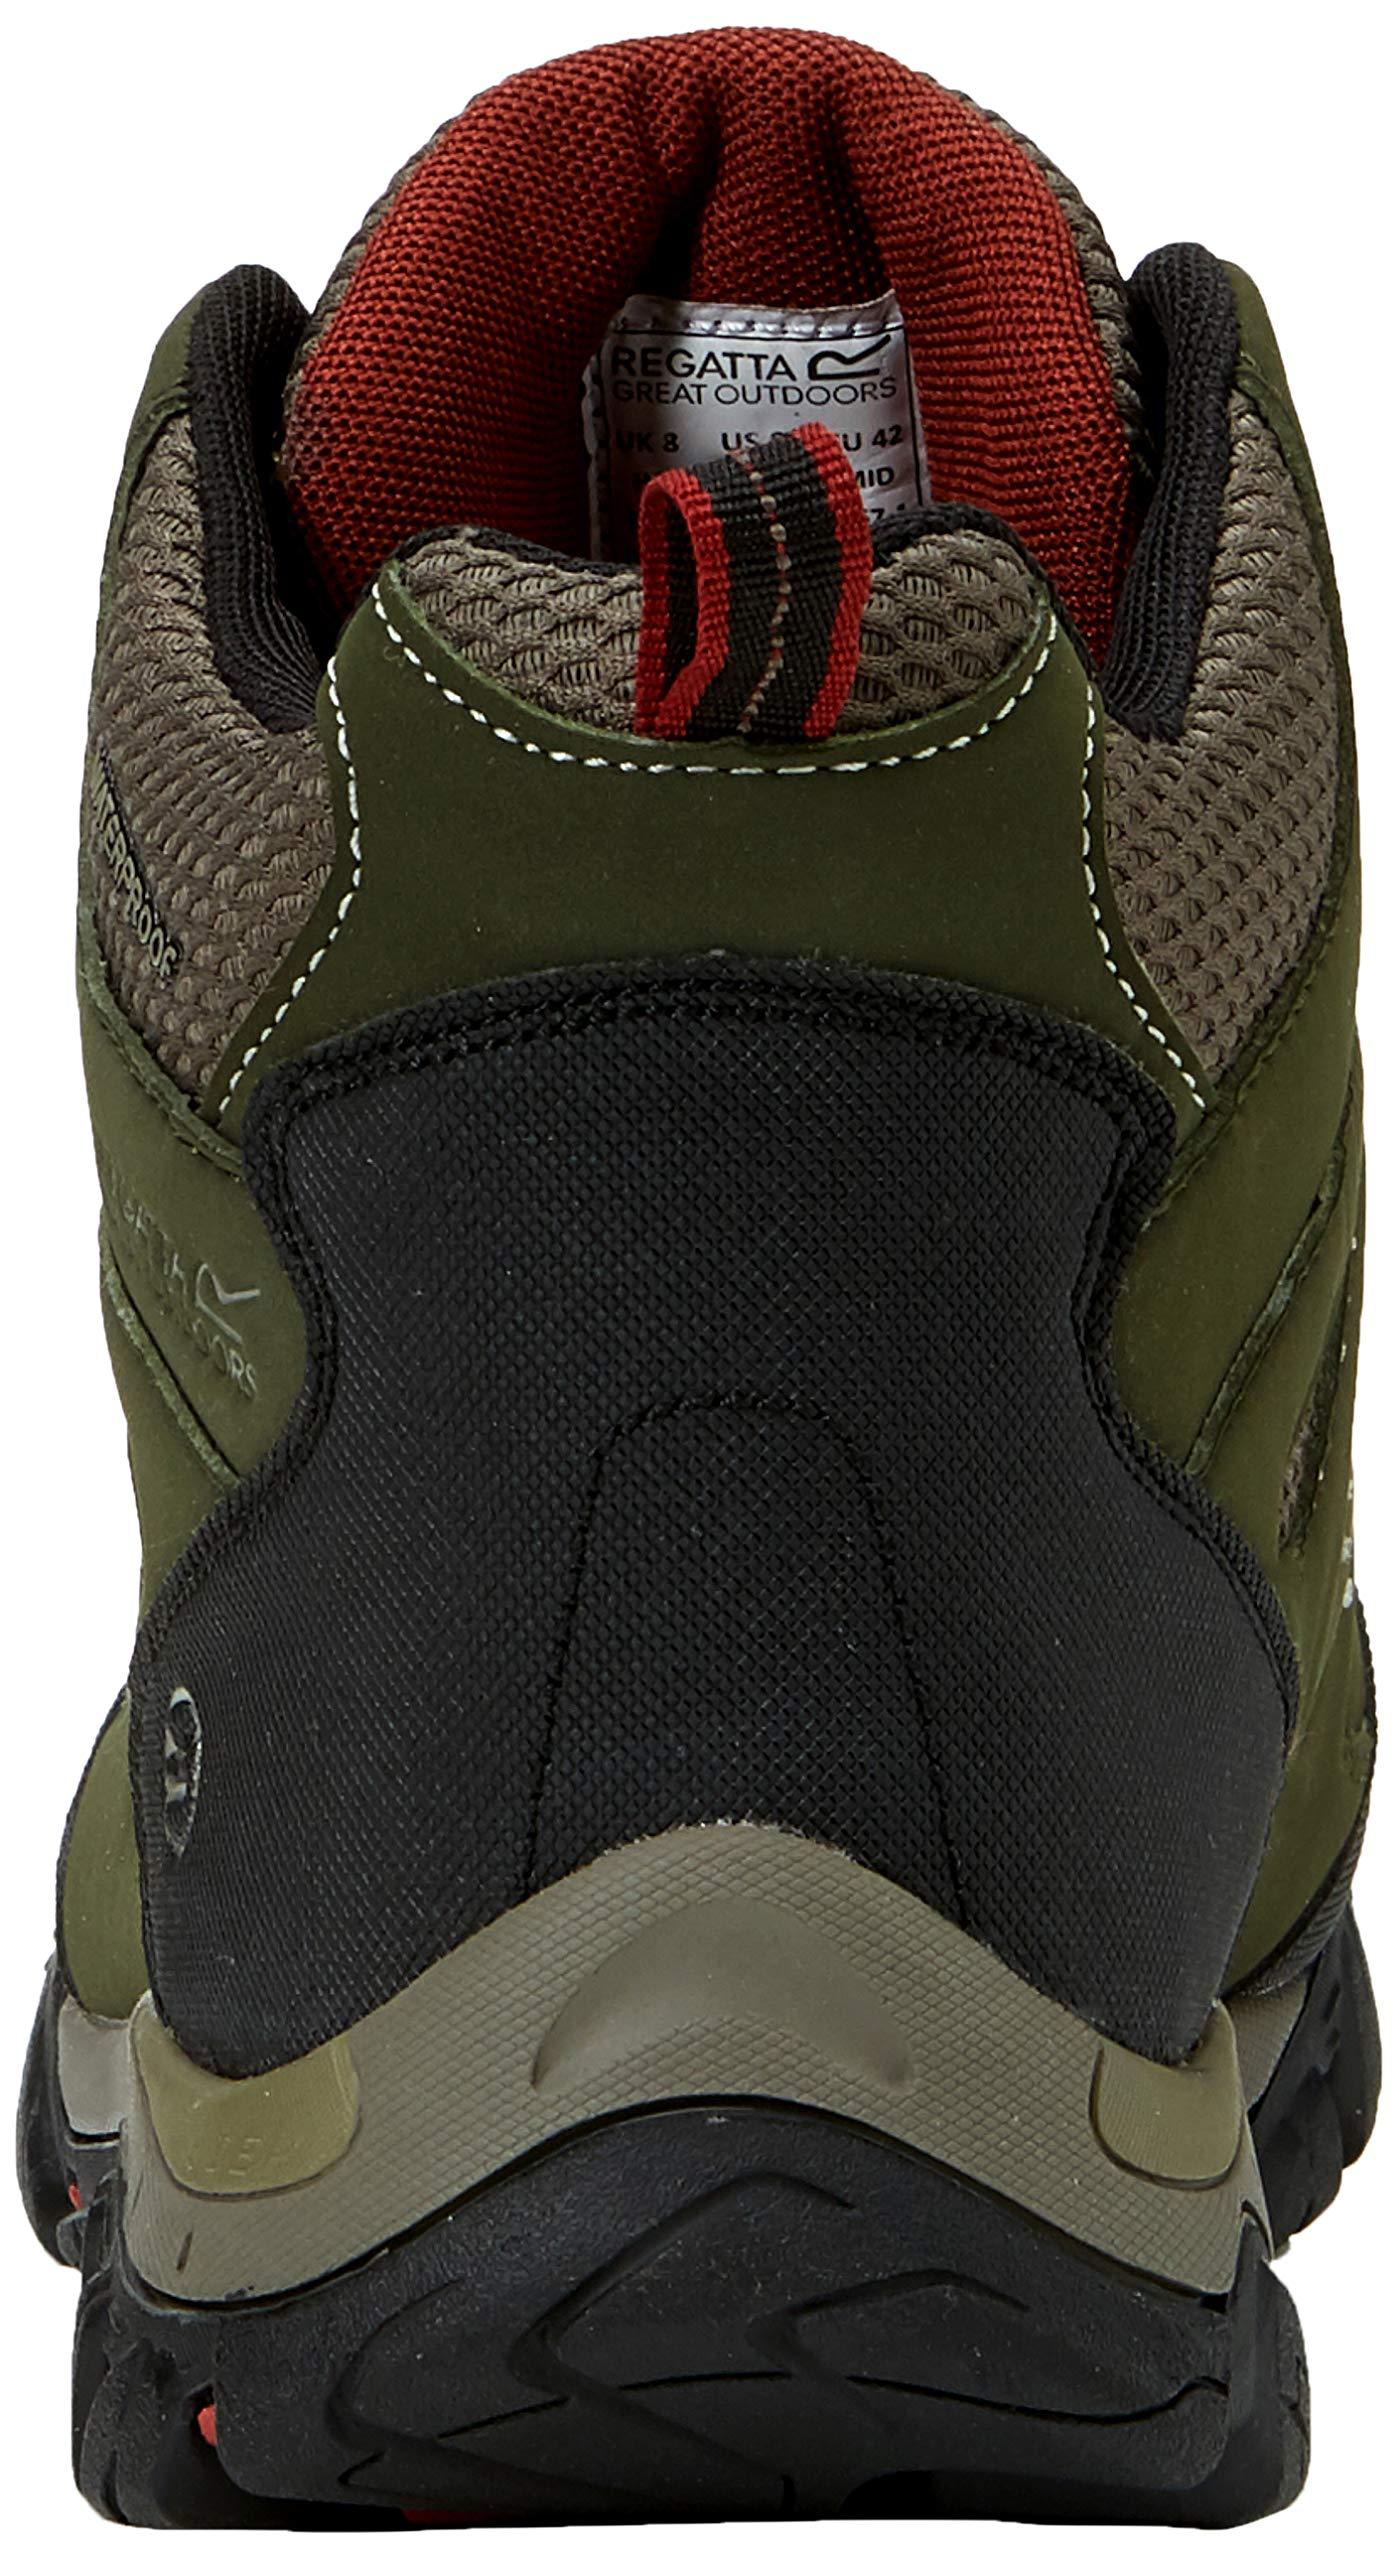 Regatta Men's Holcombe IEP Mid High Rise Hiking Boots 2